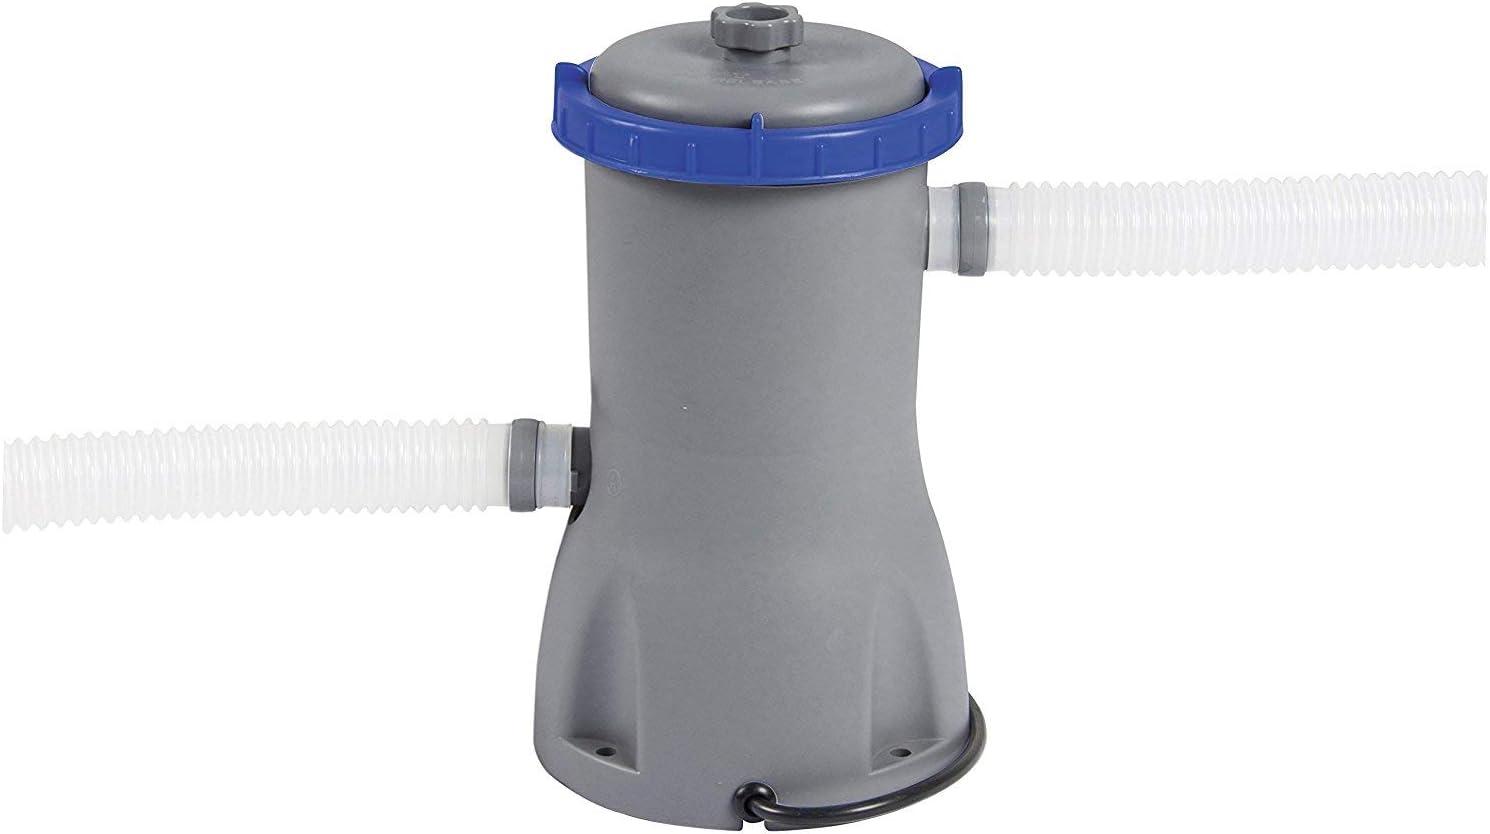 Bestway Depuradora Piscina 3,028 litros/Hora (Filtro II)